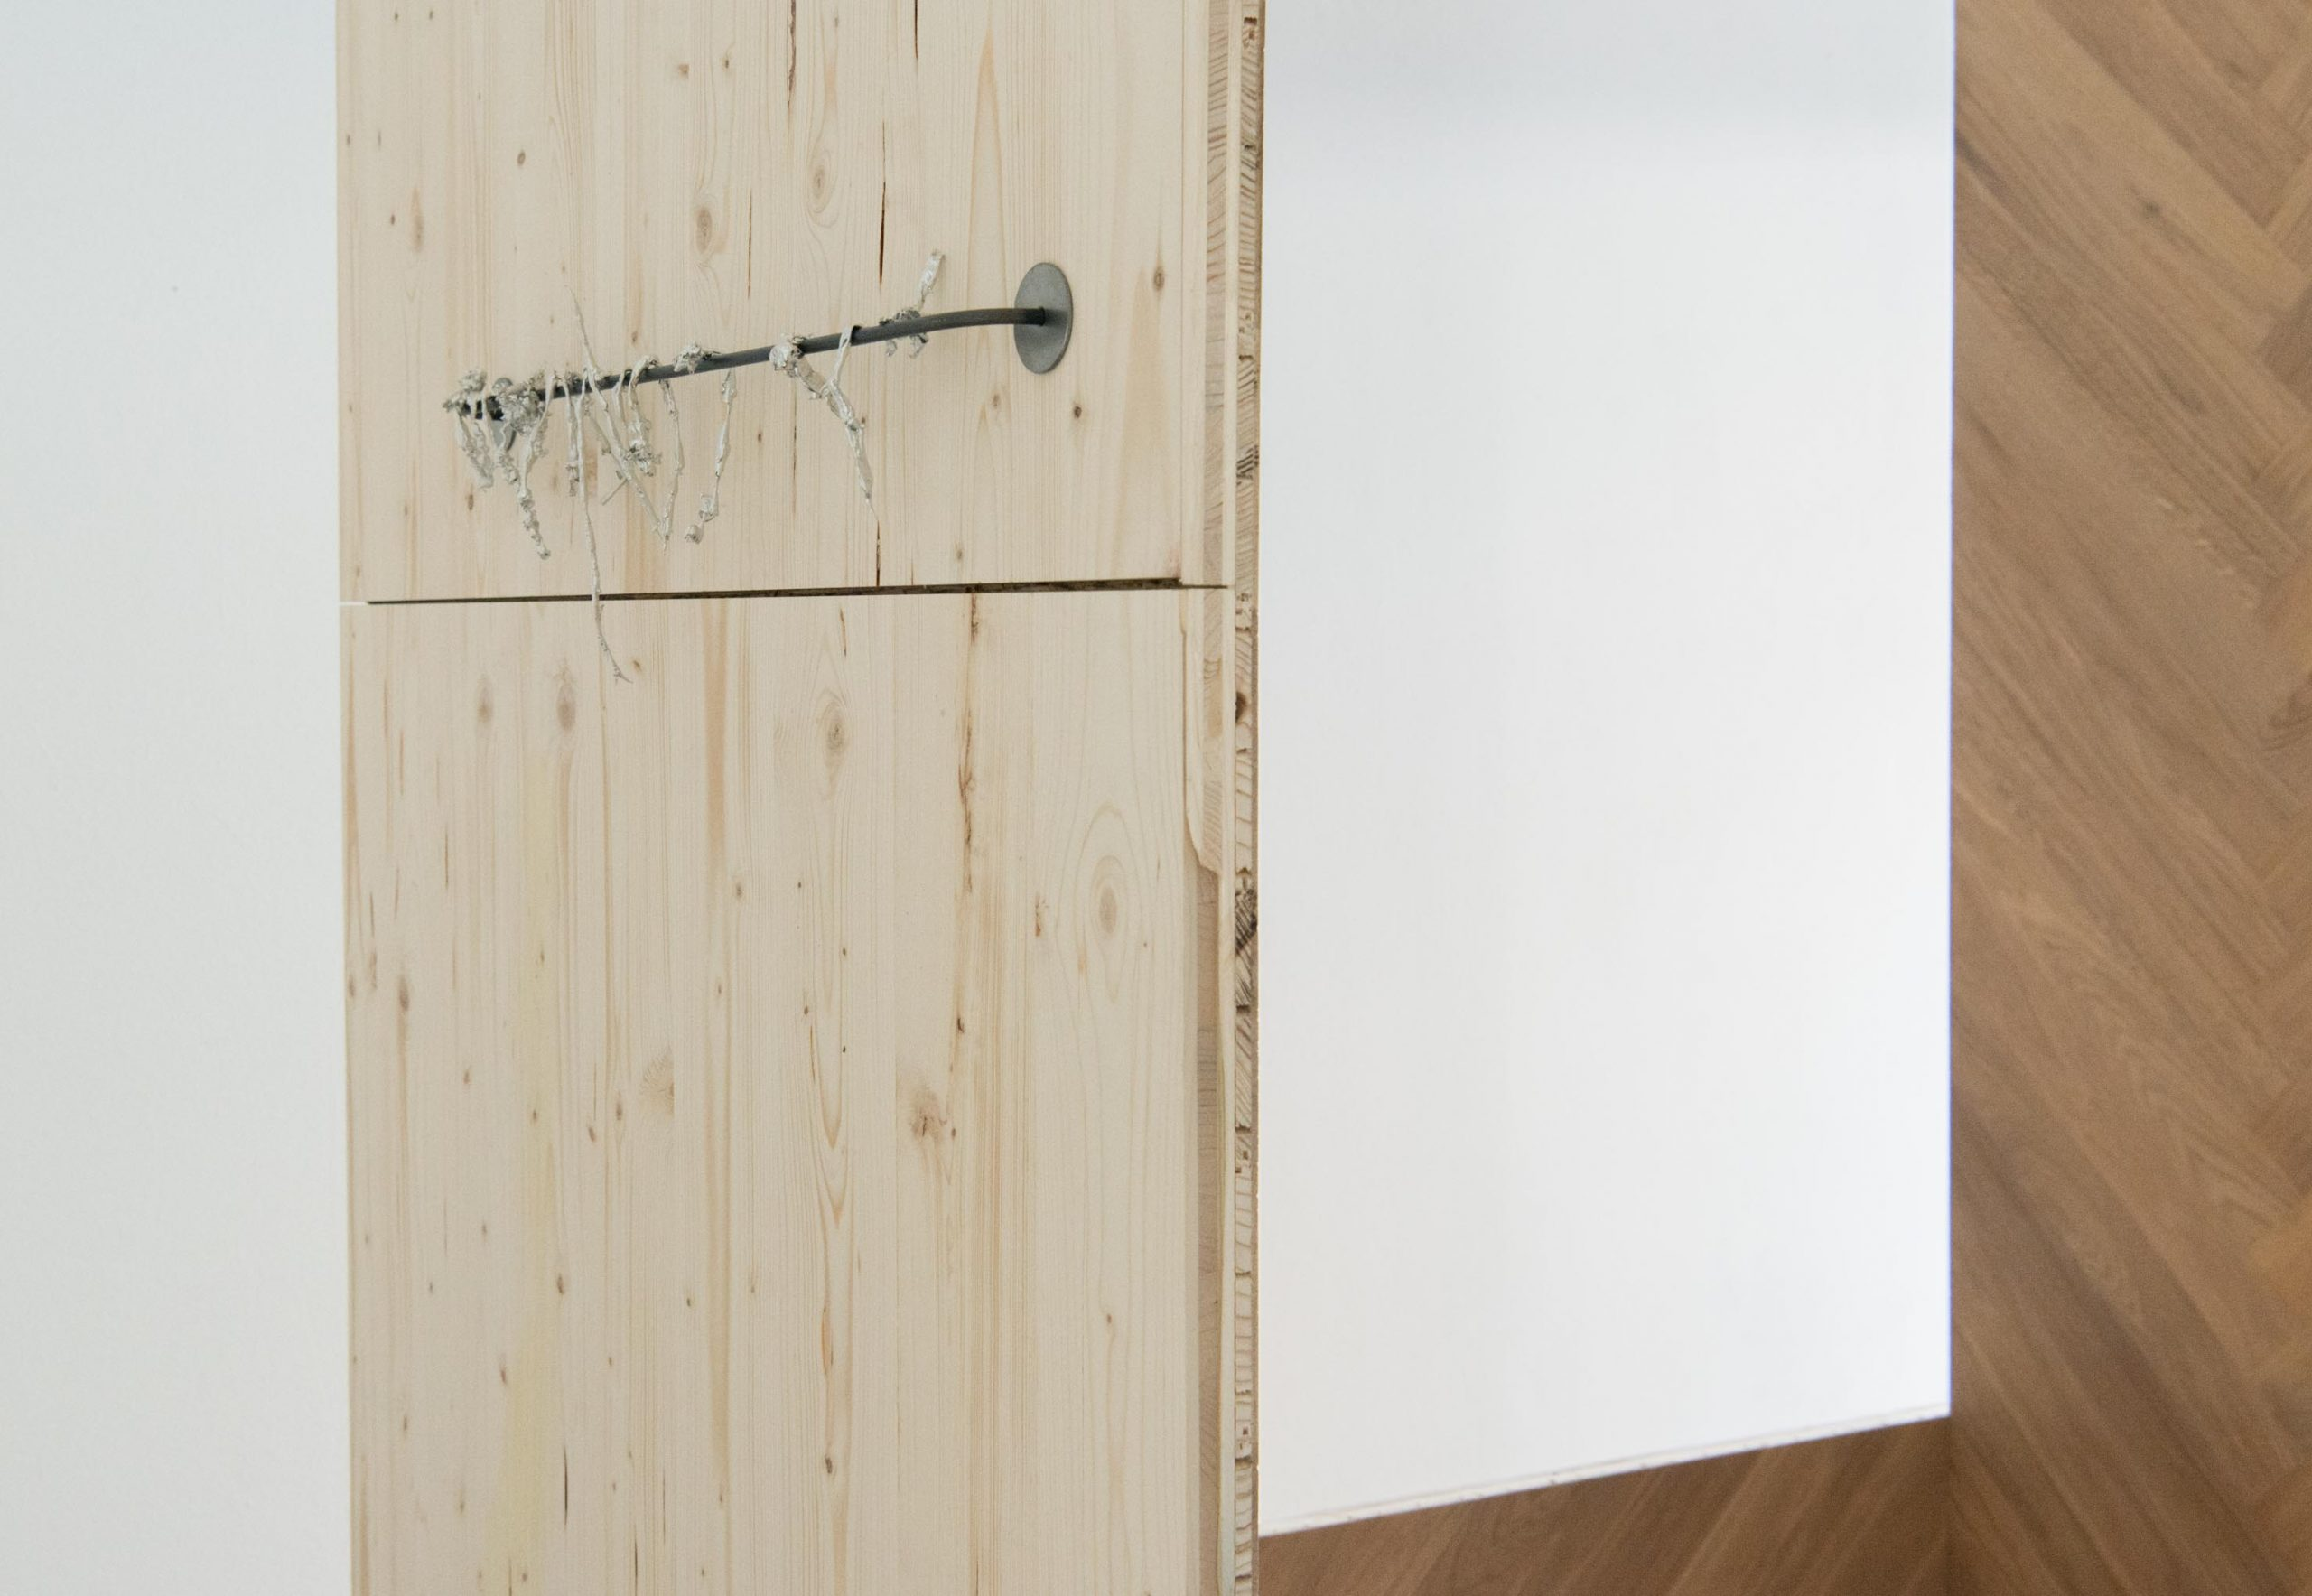 floor-work_Luka-Jana-Berchtold_2021_cSusanne-Reiterer-19